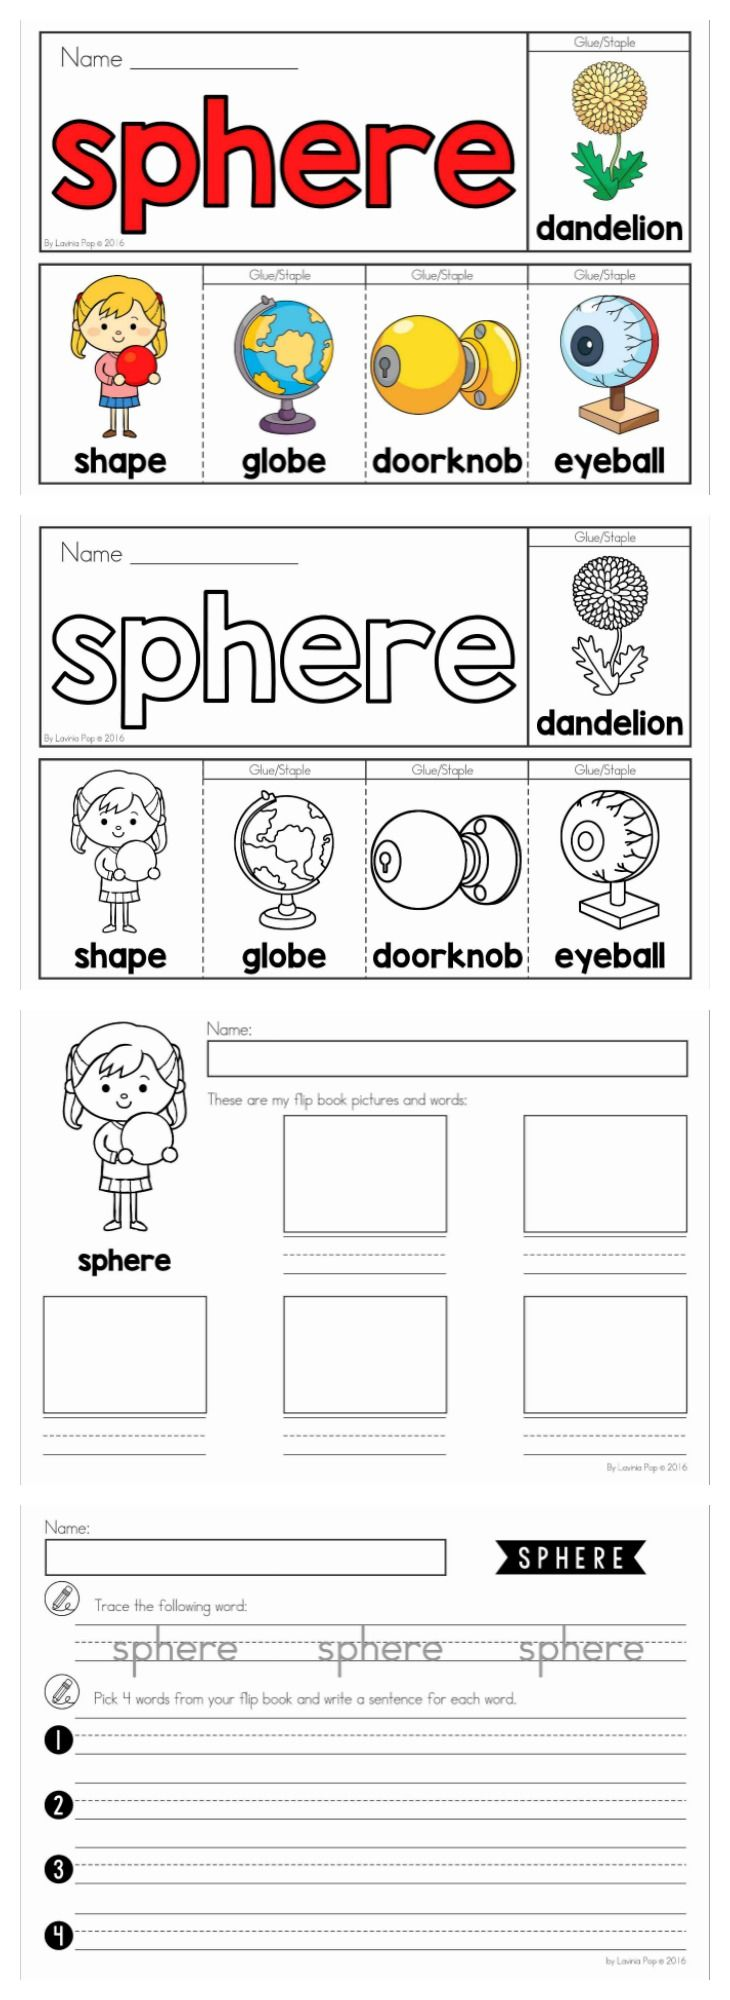 1000 ideas about shapes worksheets on pinterest learning shapes tracing shapes and worksheets. Black Bedroom Furniture Sets. Home Design Ideas